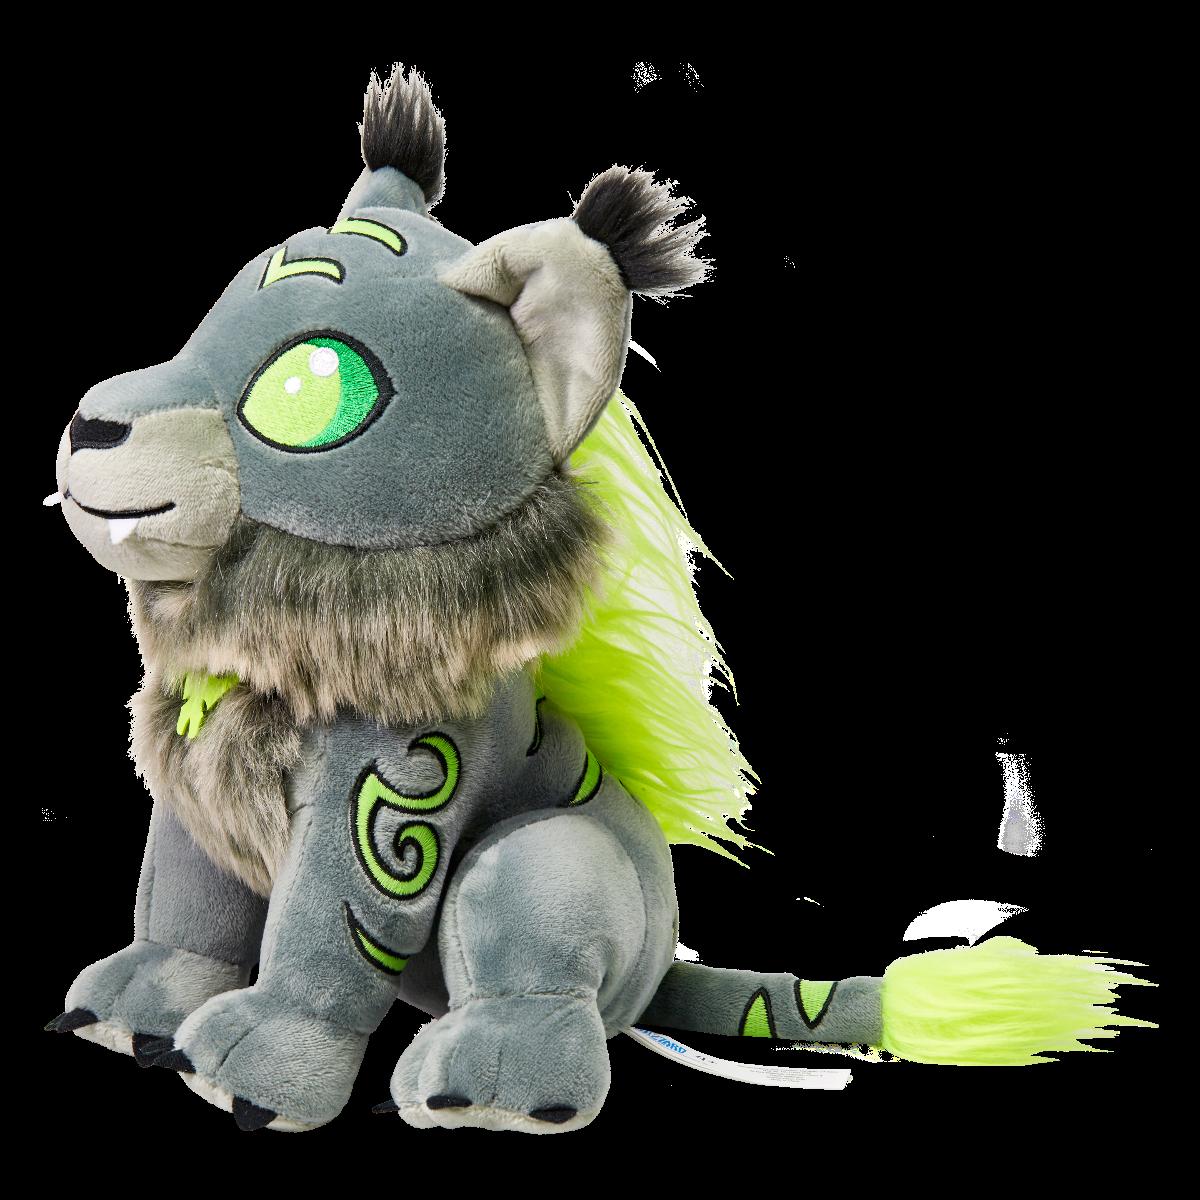 "World of Warcraft Mischief Plush Pet ONLY Glow in the Dark 8.5"" Tall - Blizzard"